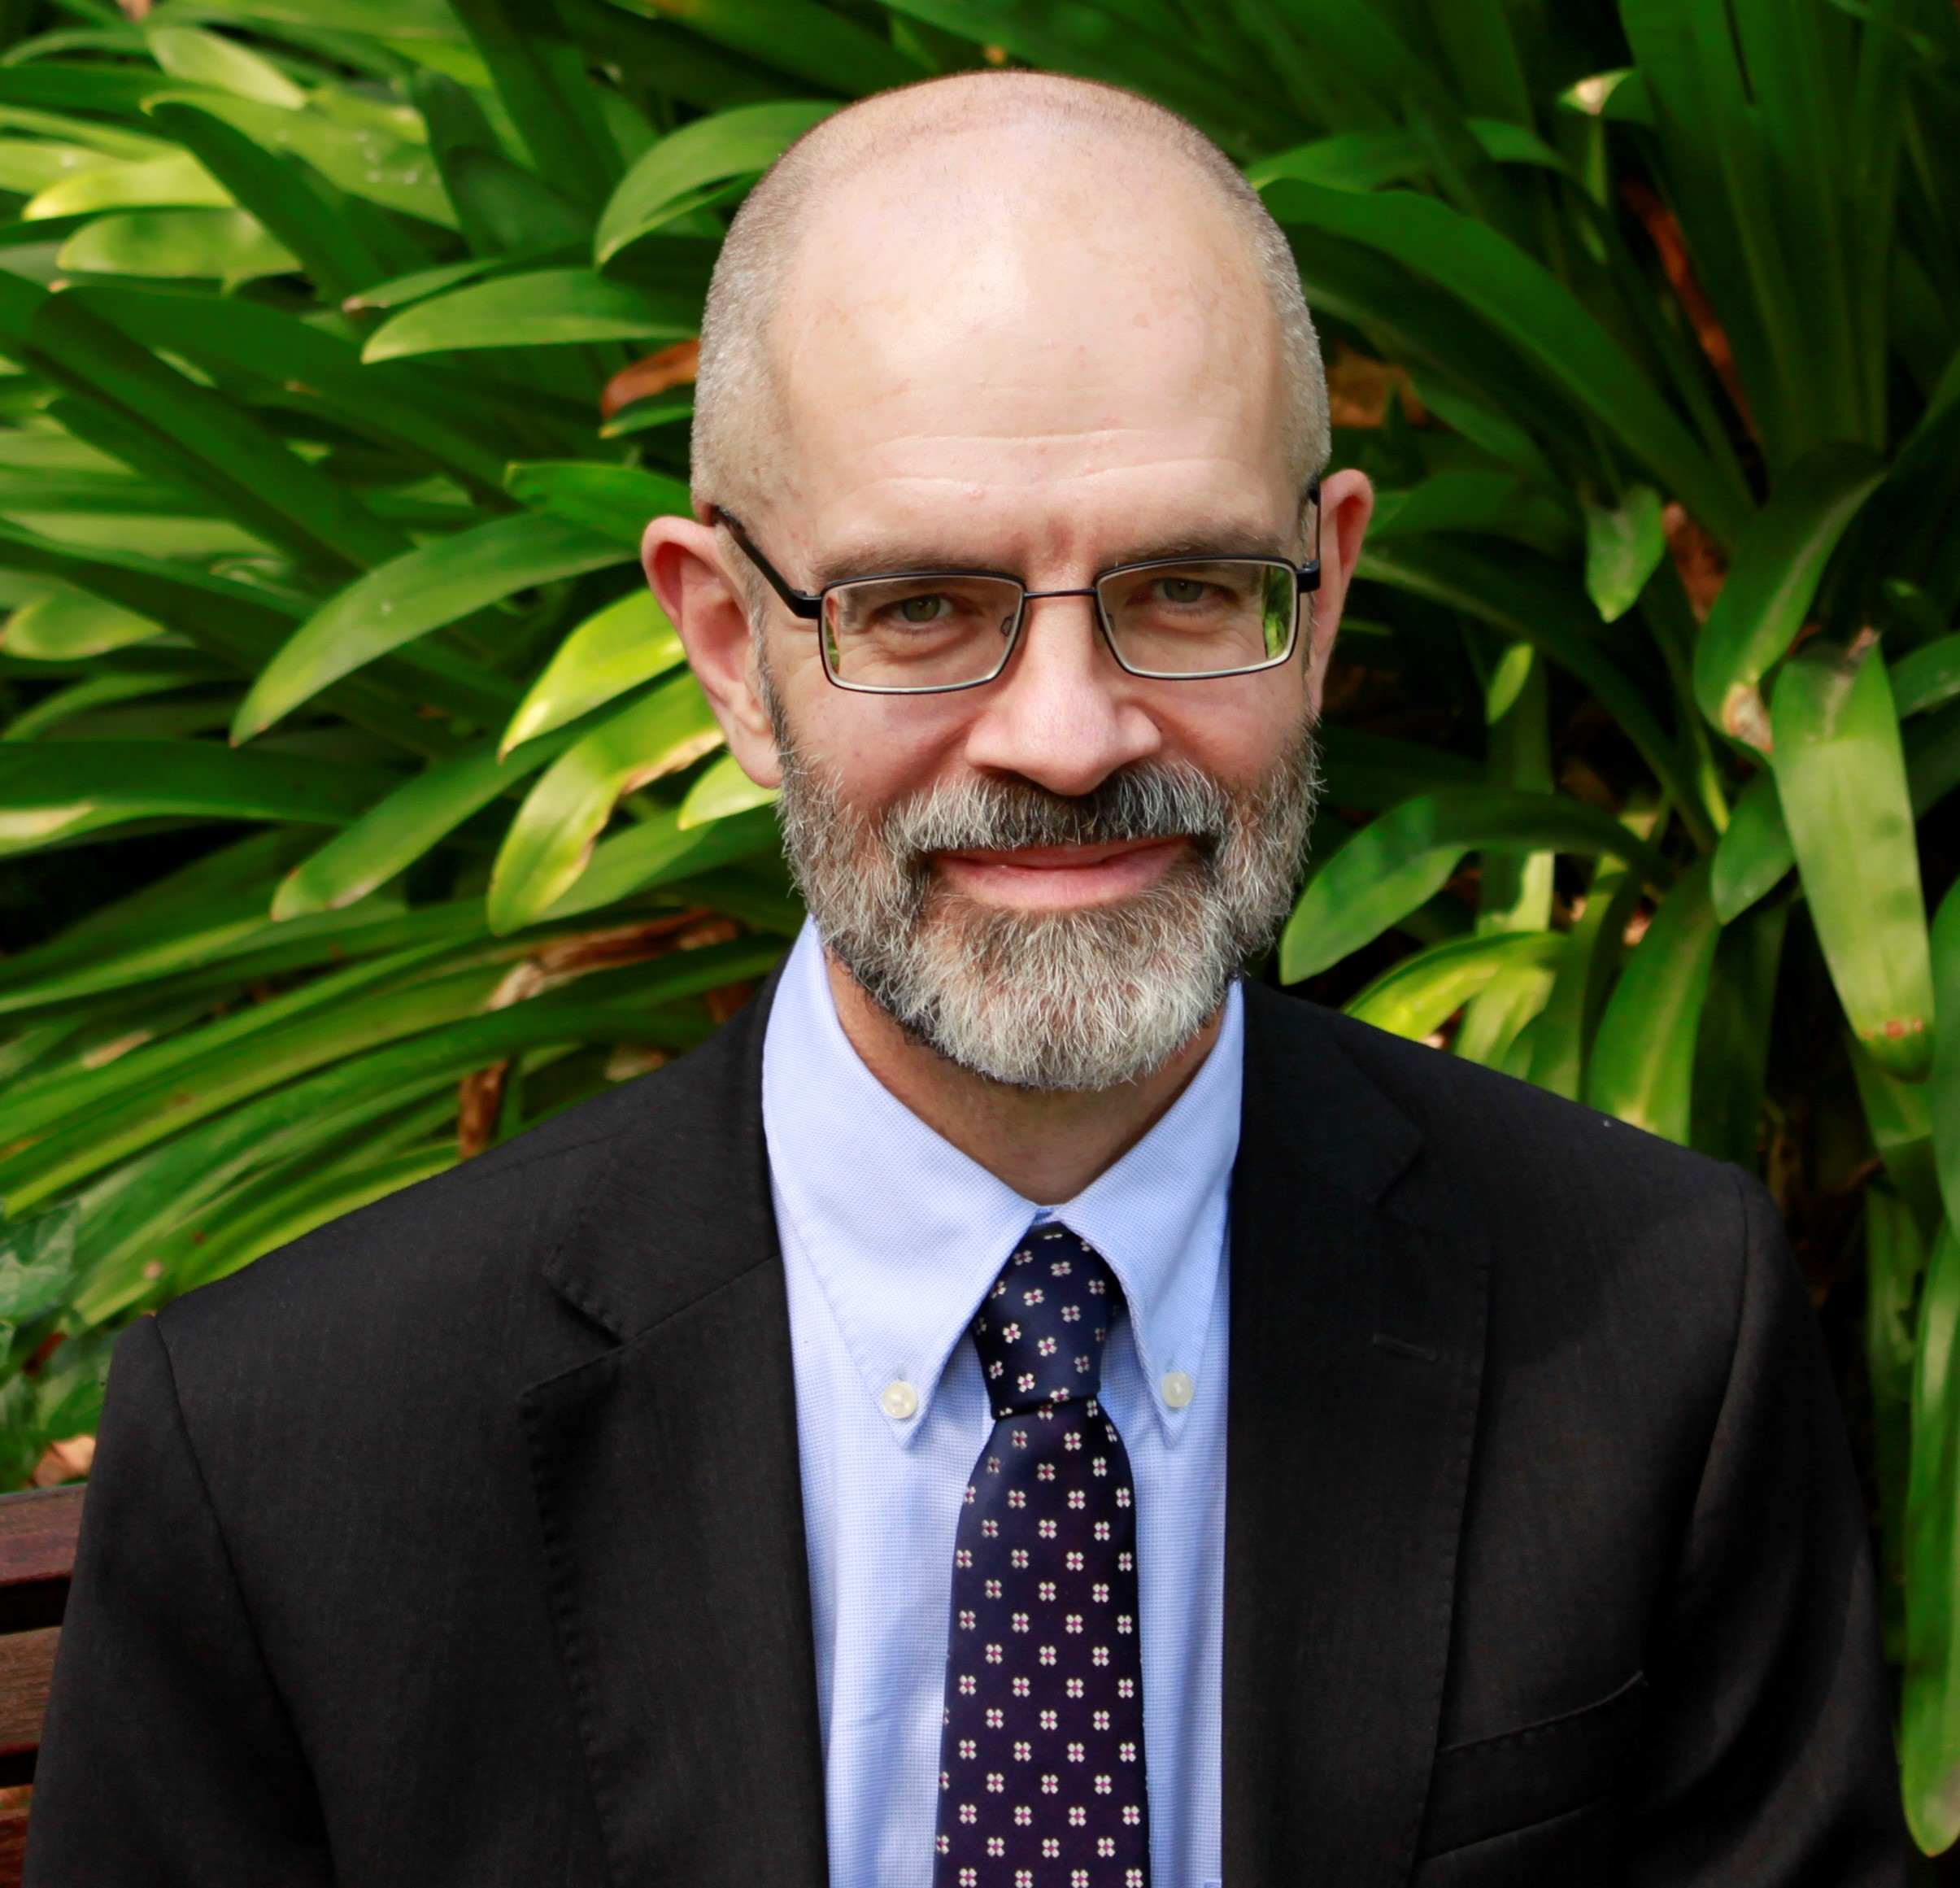 APSACC 2019- Paul Grimes cropped profile photo.jpg